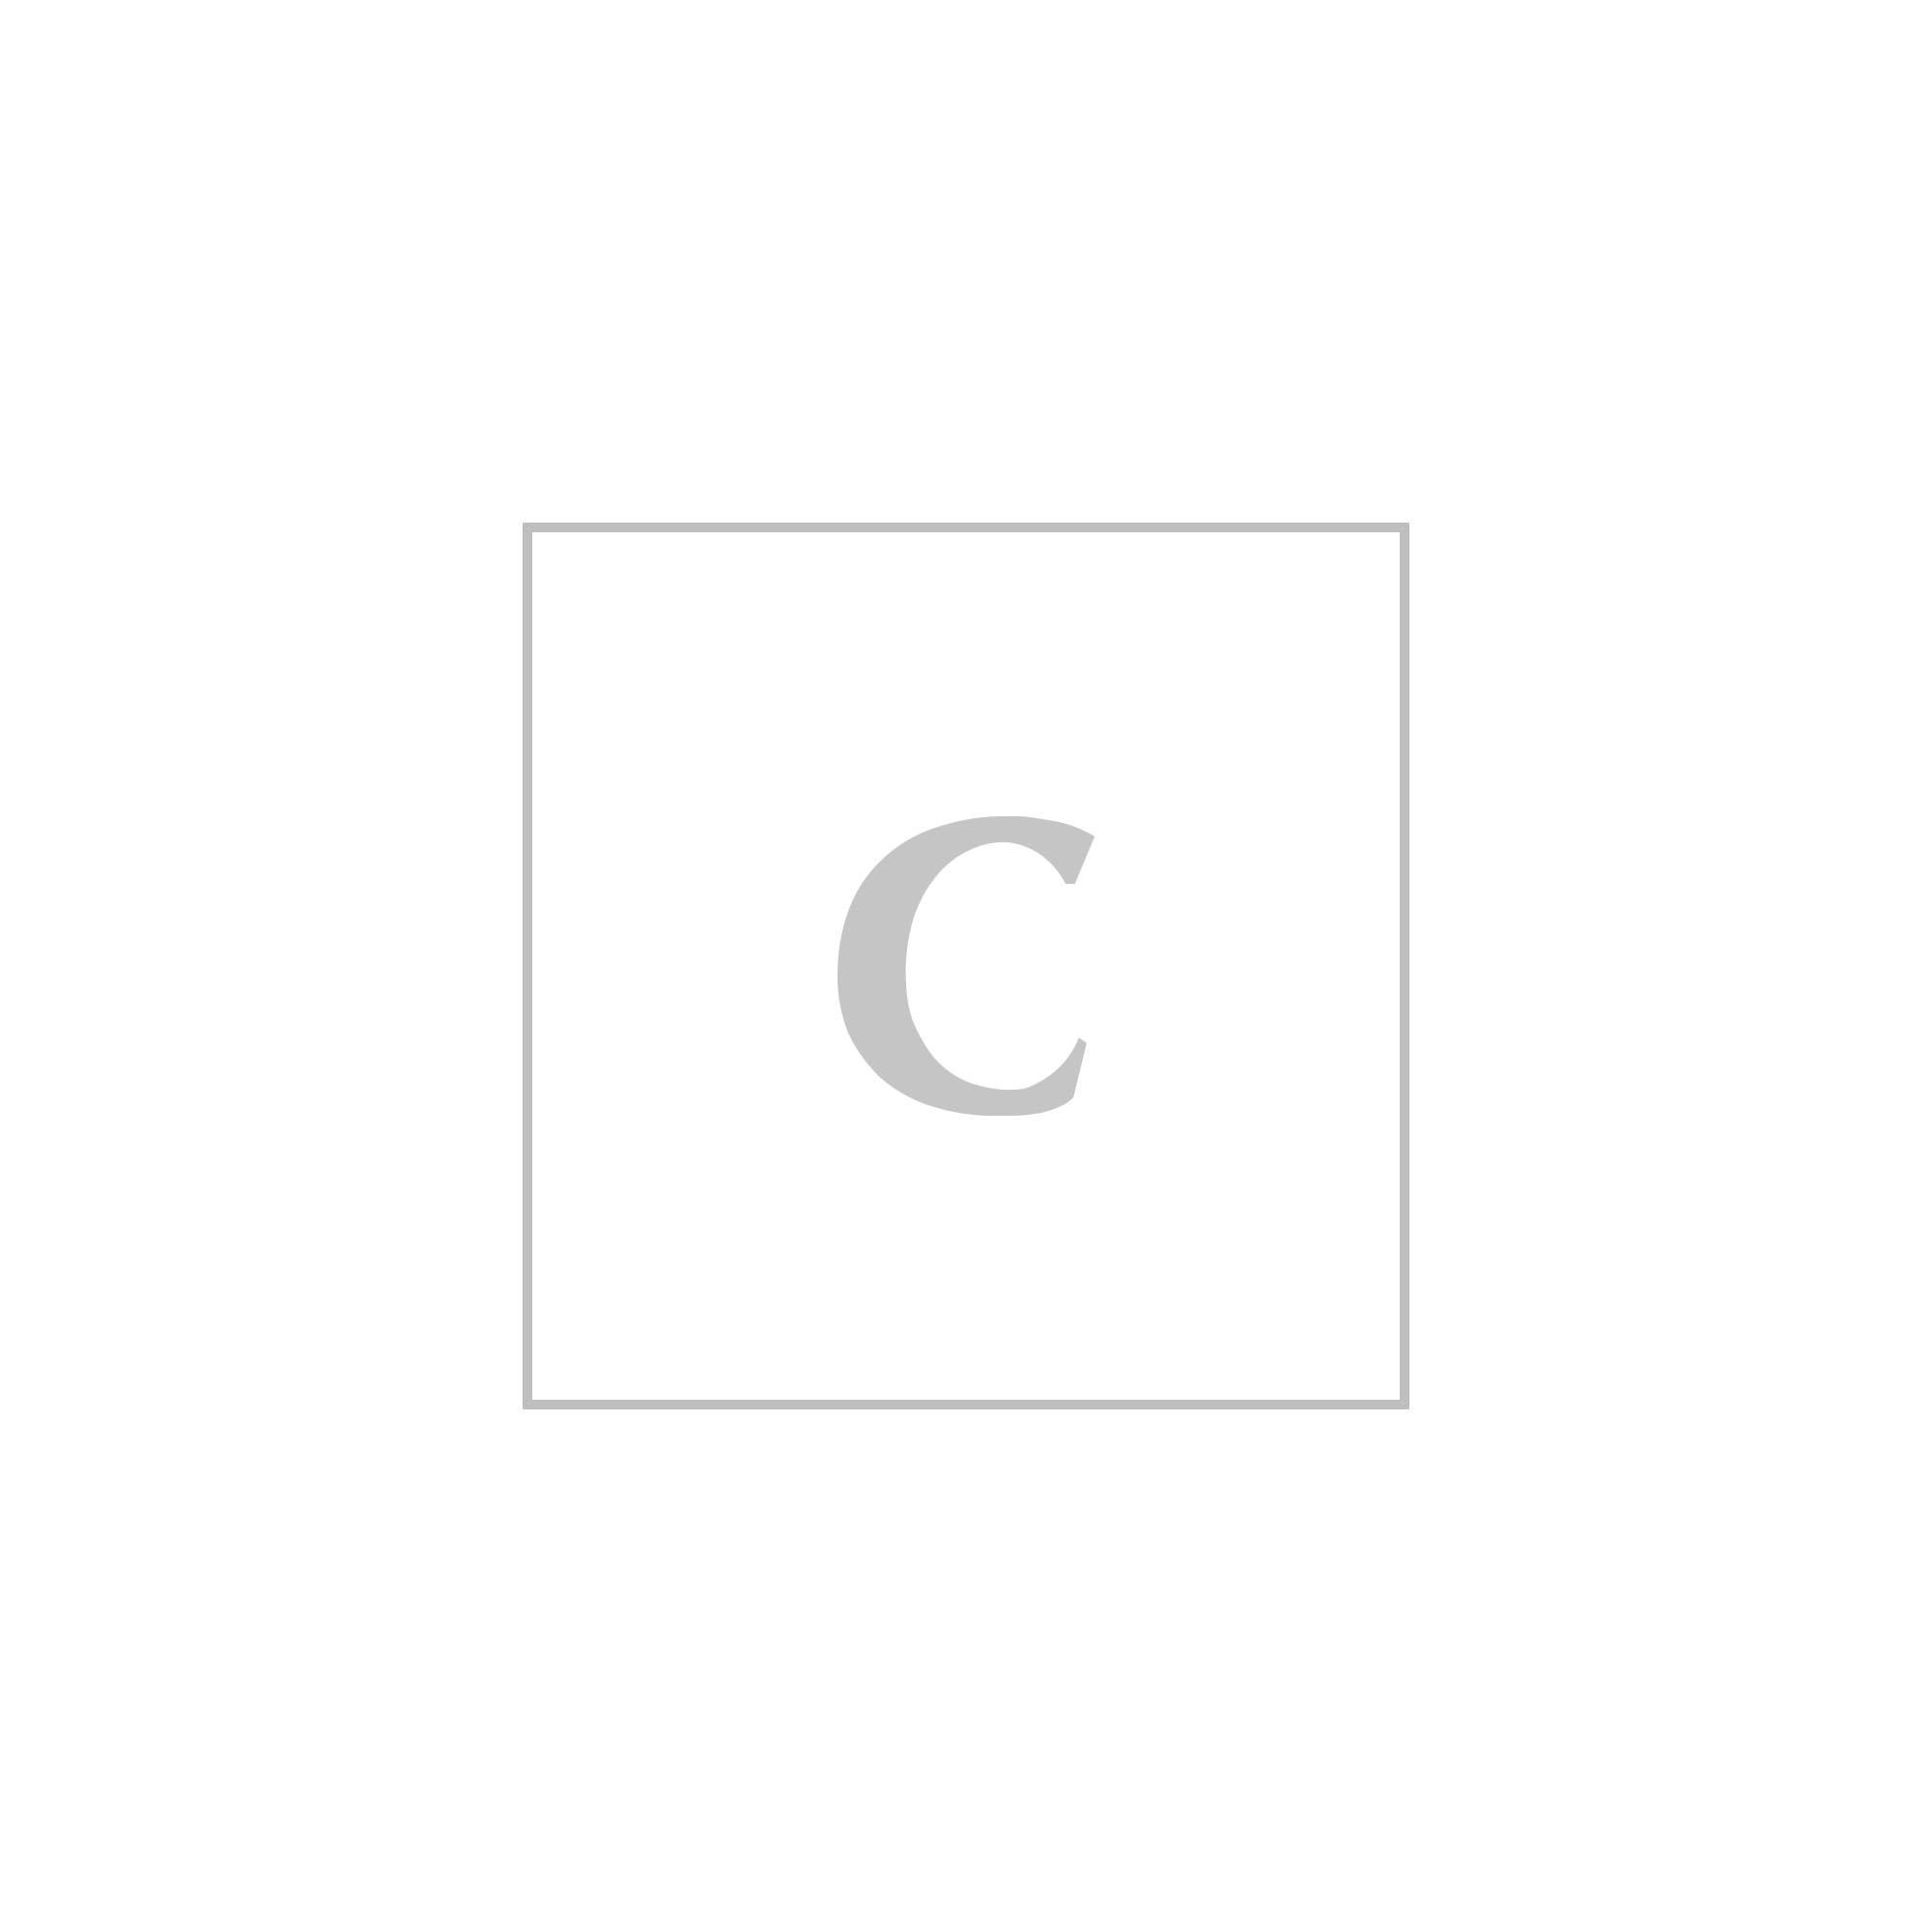 foto ufficiali 92555 1efec Dolce & Gabbana Wallets da Men Misto